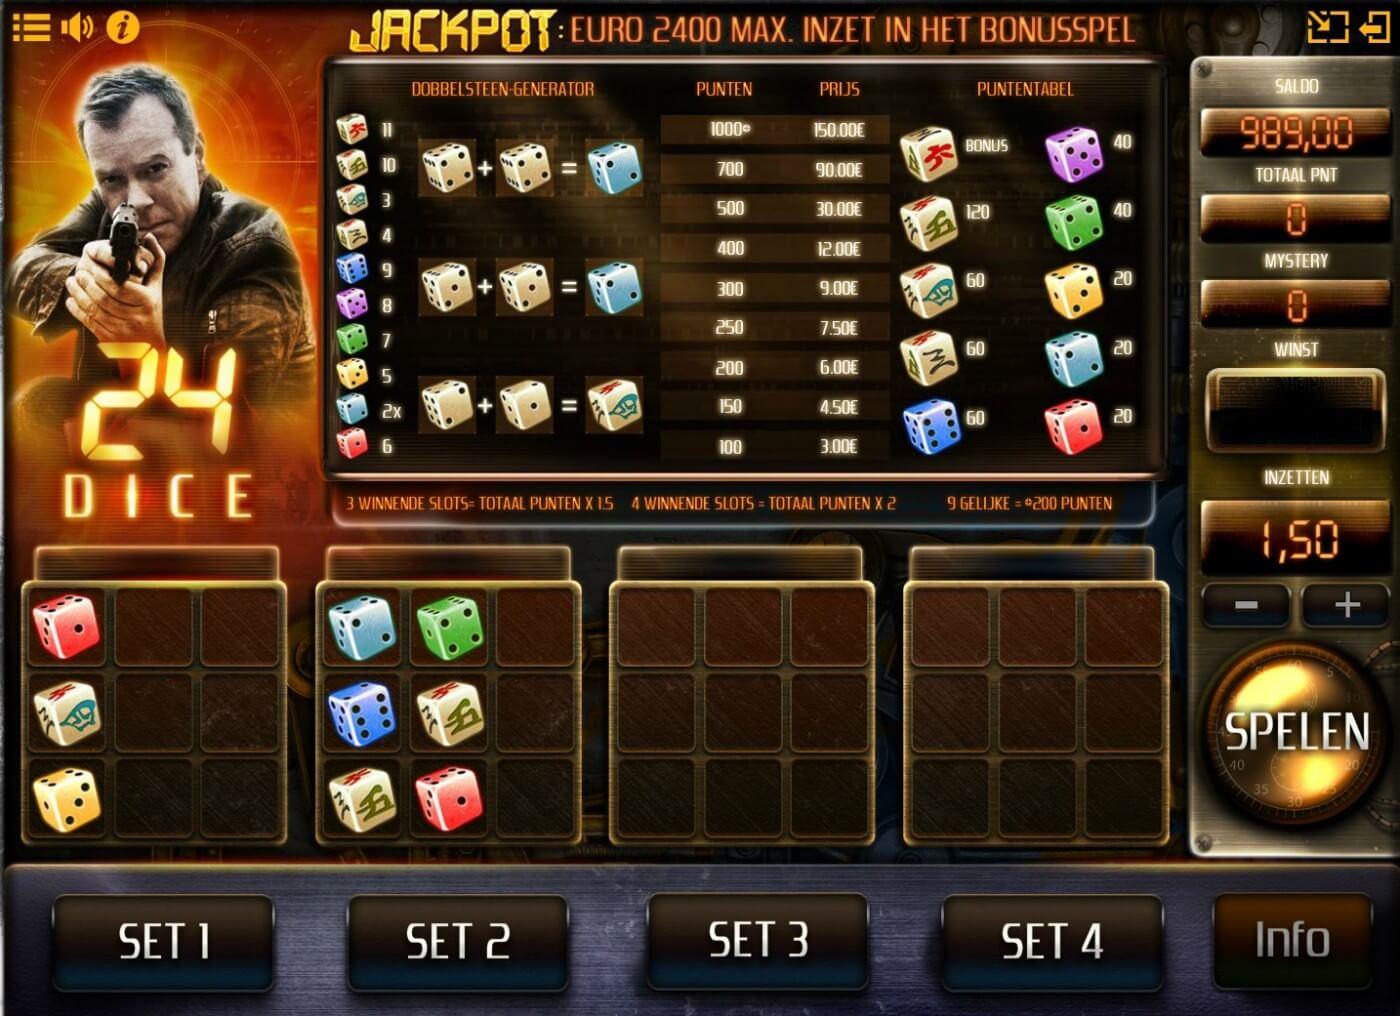 24 iSoftBet Gokkast Bonusgame